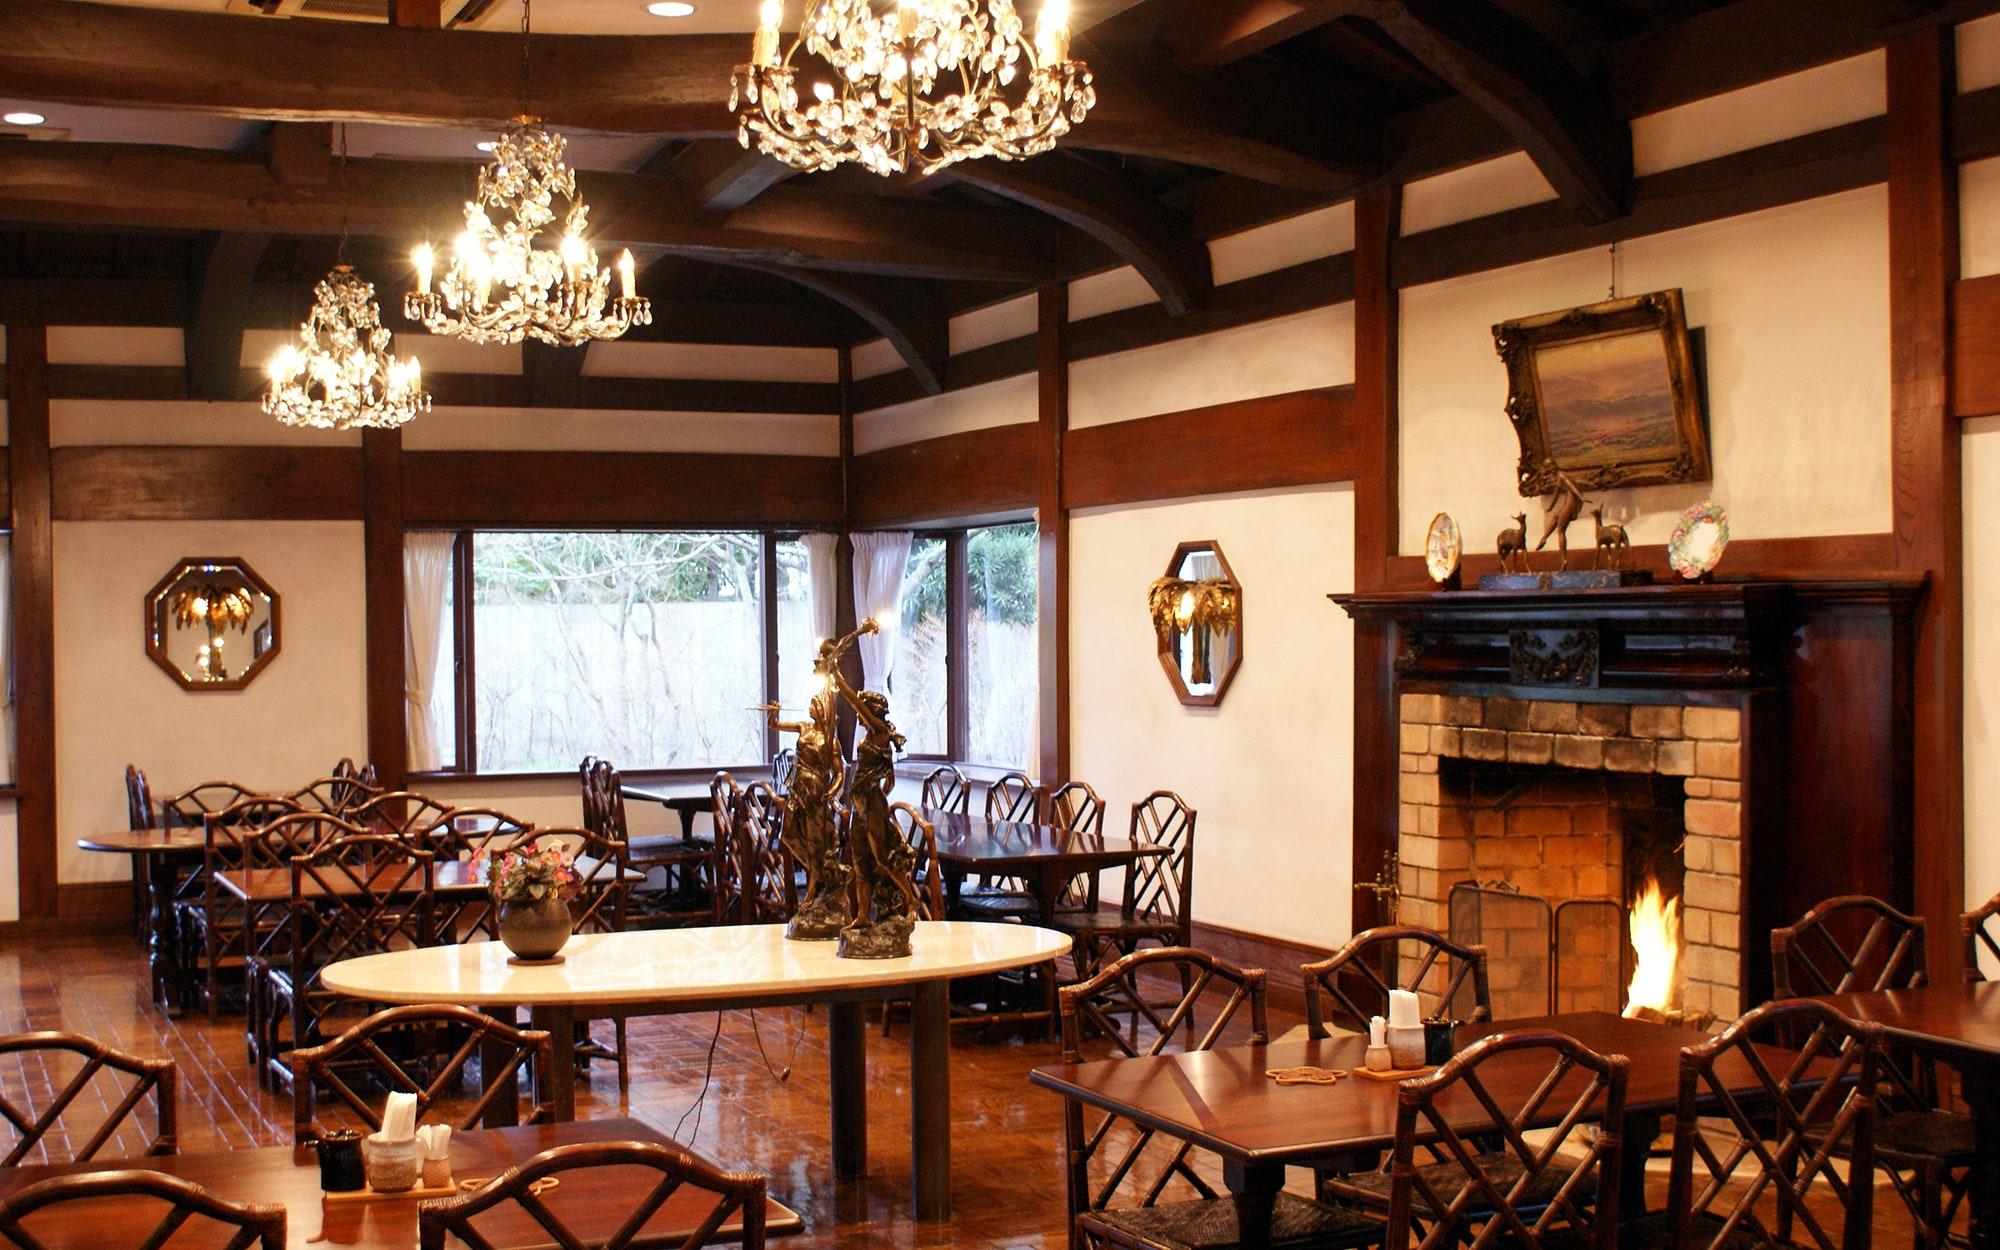 暖炉のある部屋 - 山口県 萩市|世界遺産[萩城下町]唯一の旅館 萩城三の丸 北門屋敷